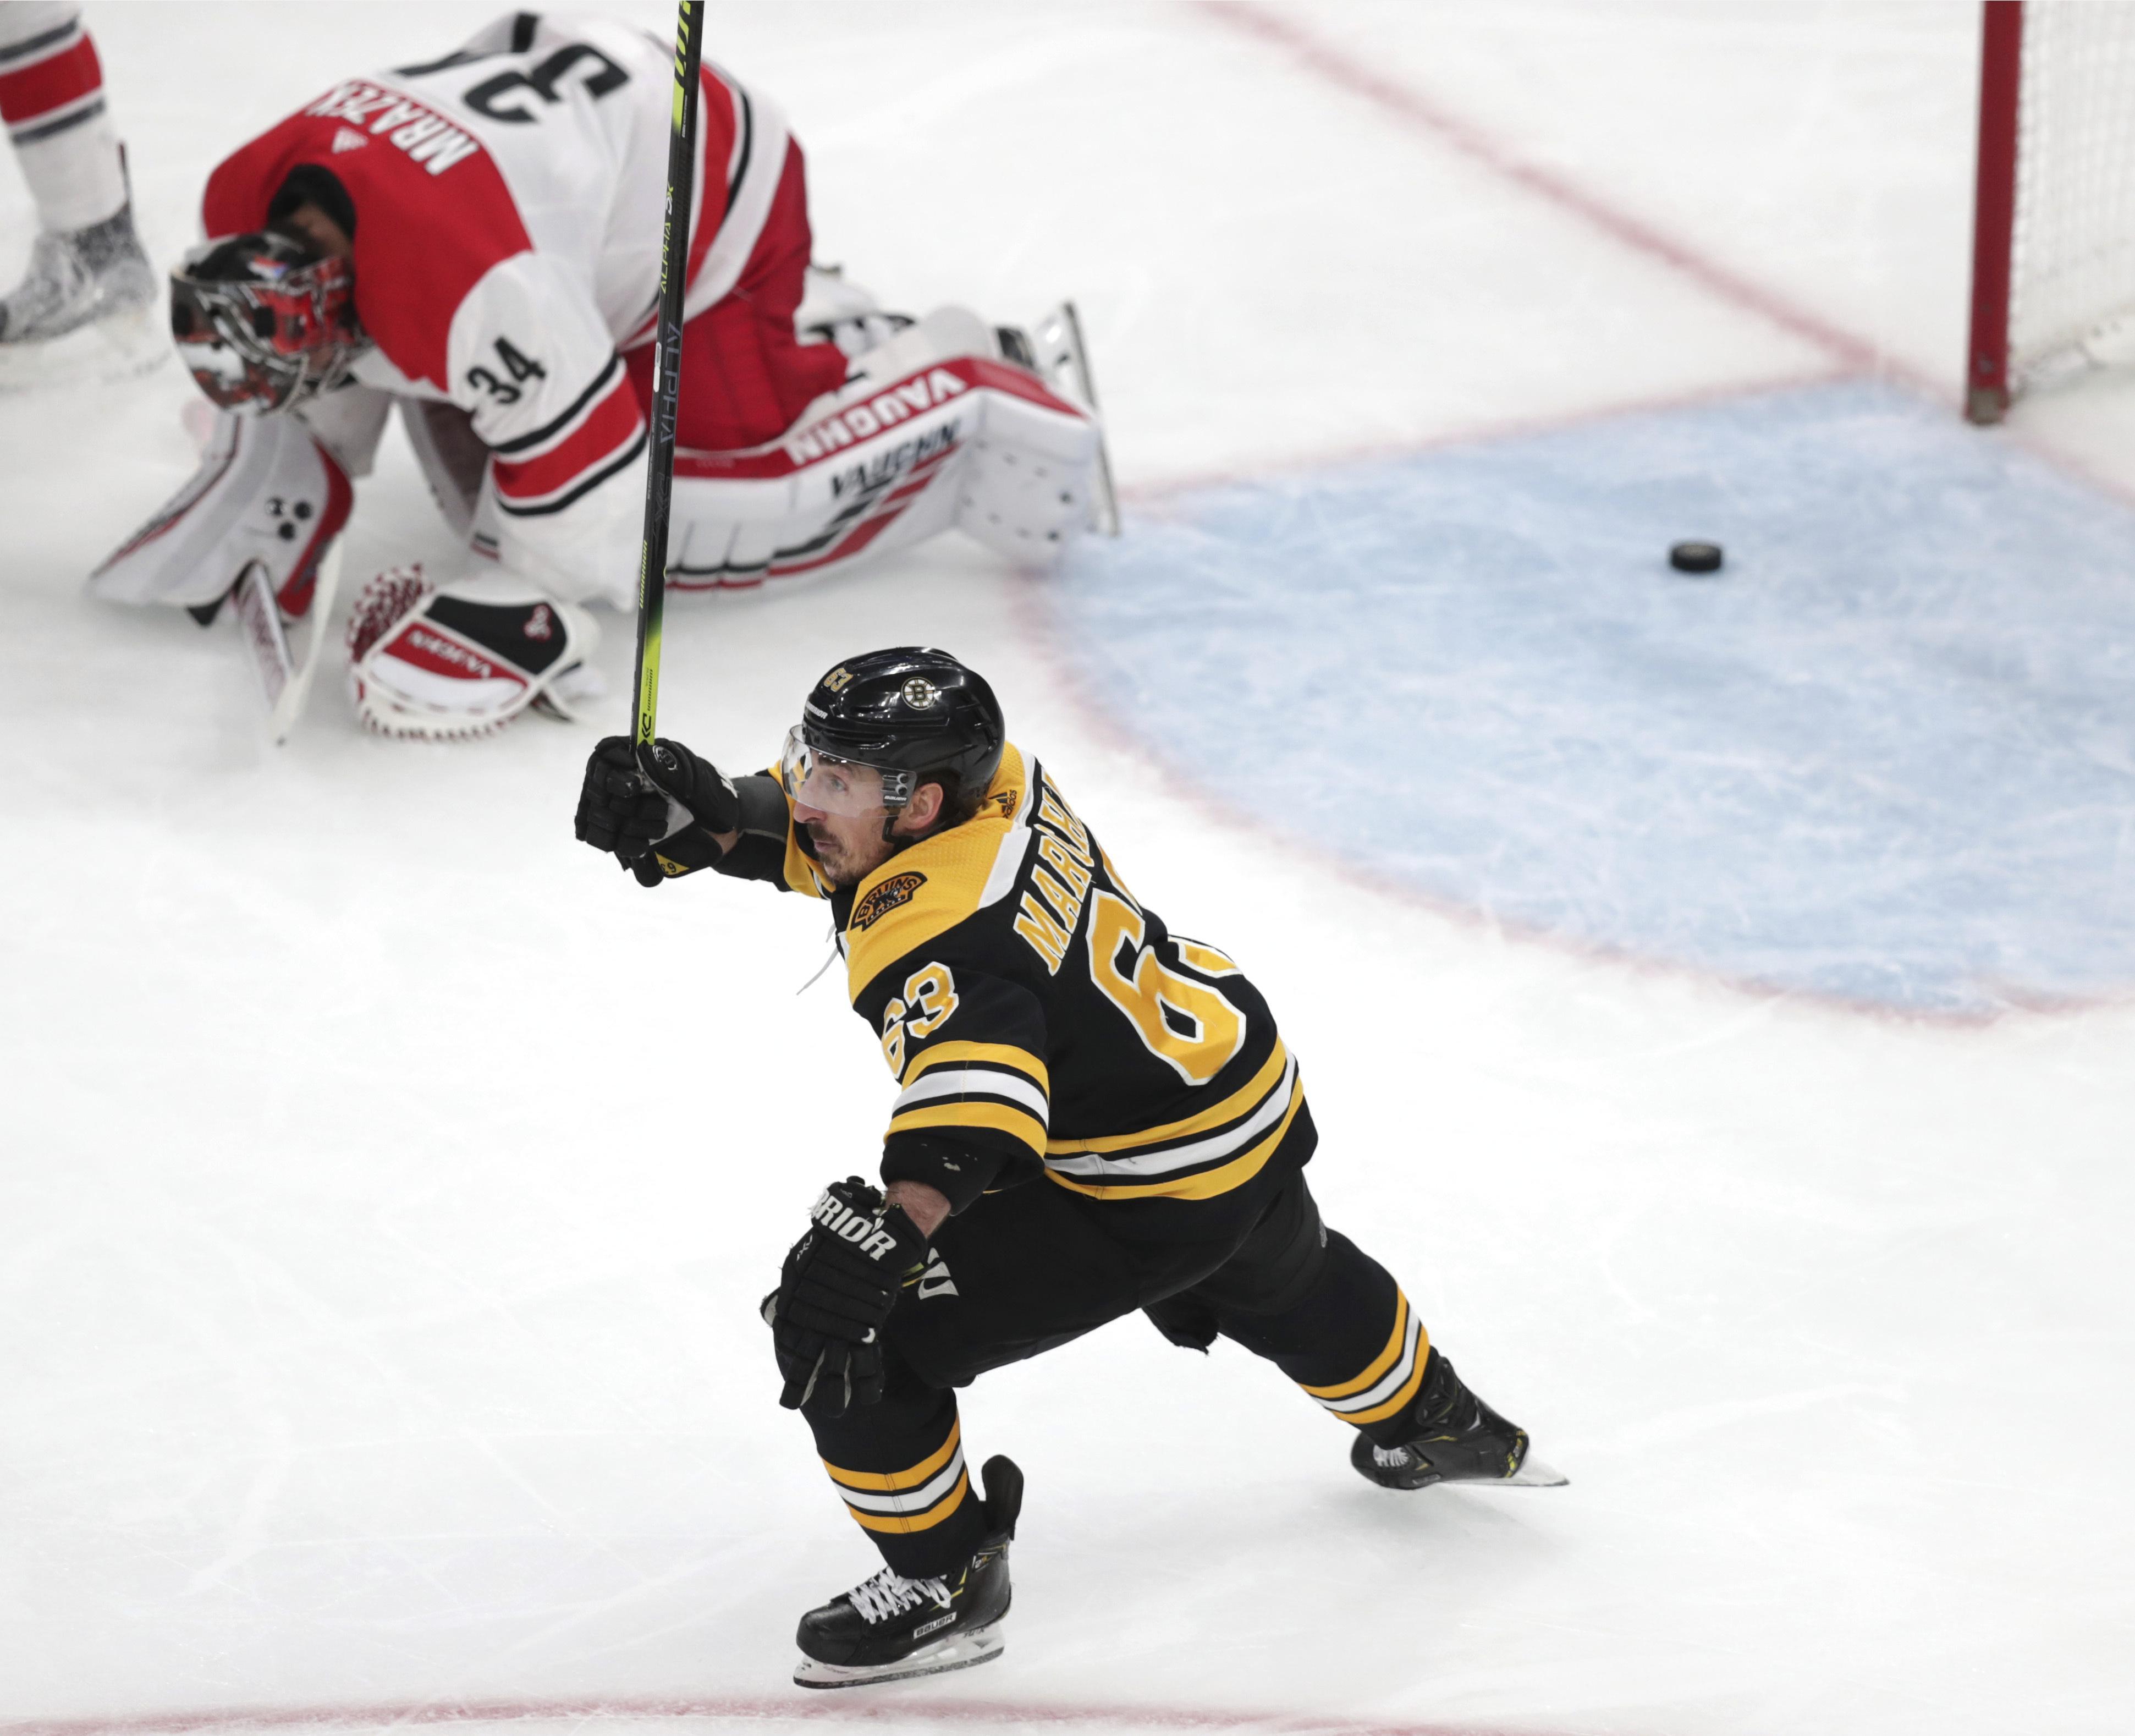 release date f24d8 15084 Bruins' score 4 goals in 3rd, beat Hurricanes 5-2 in Game 1 ...